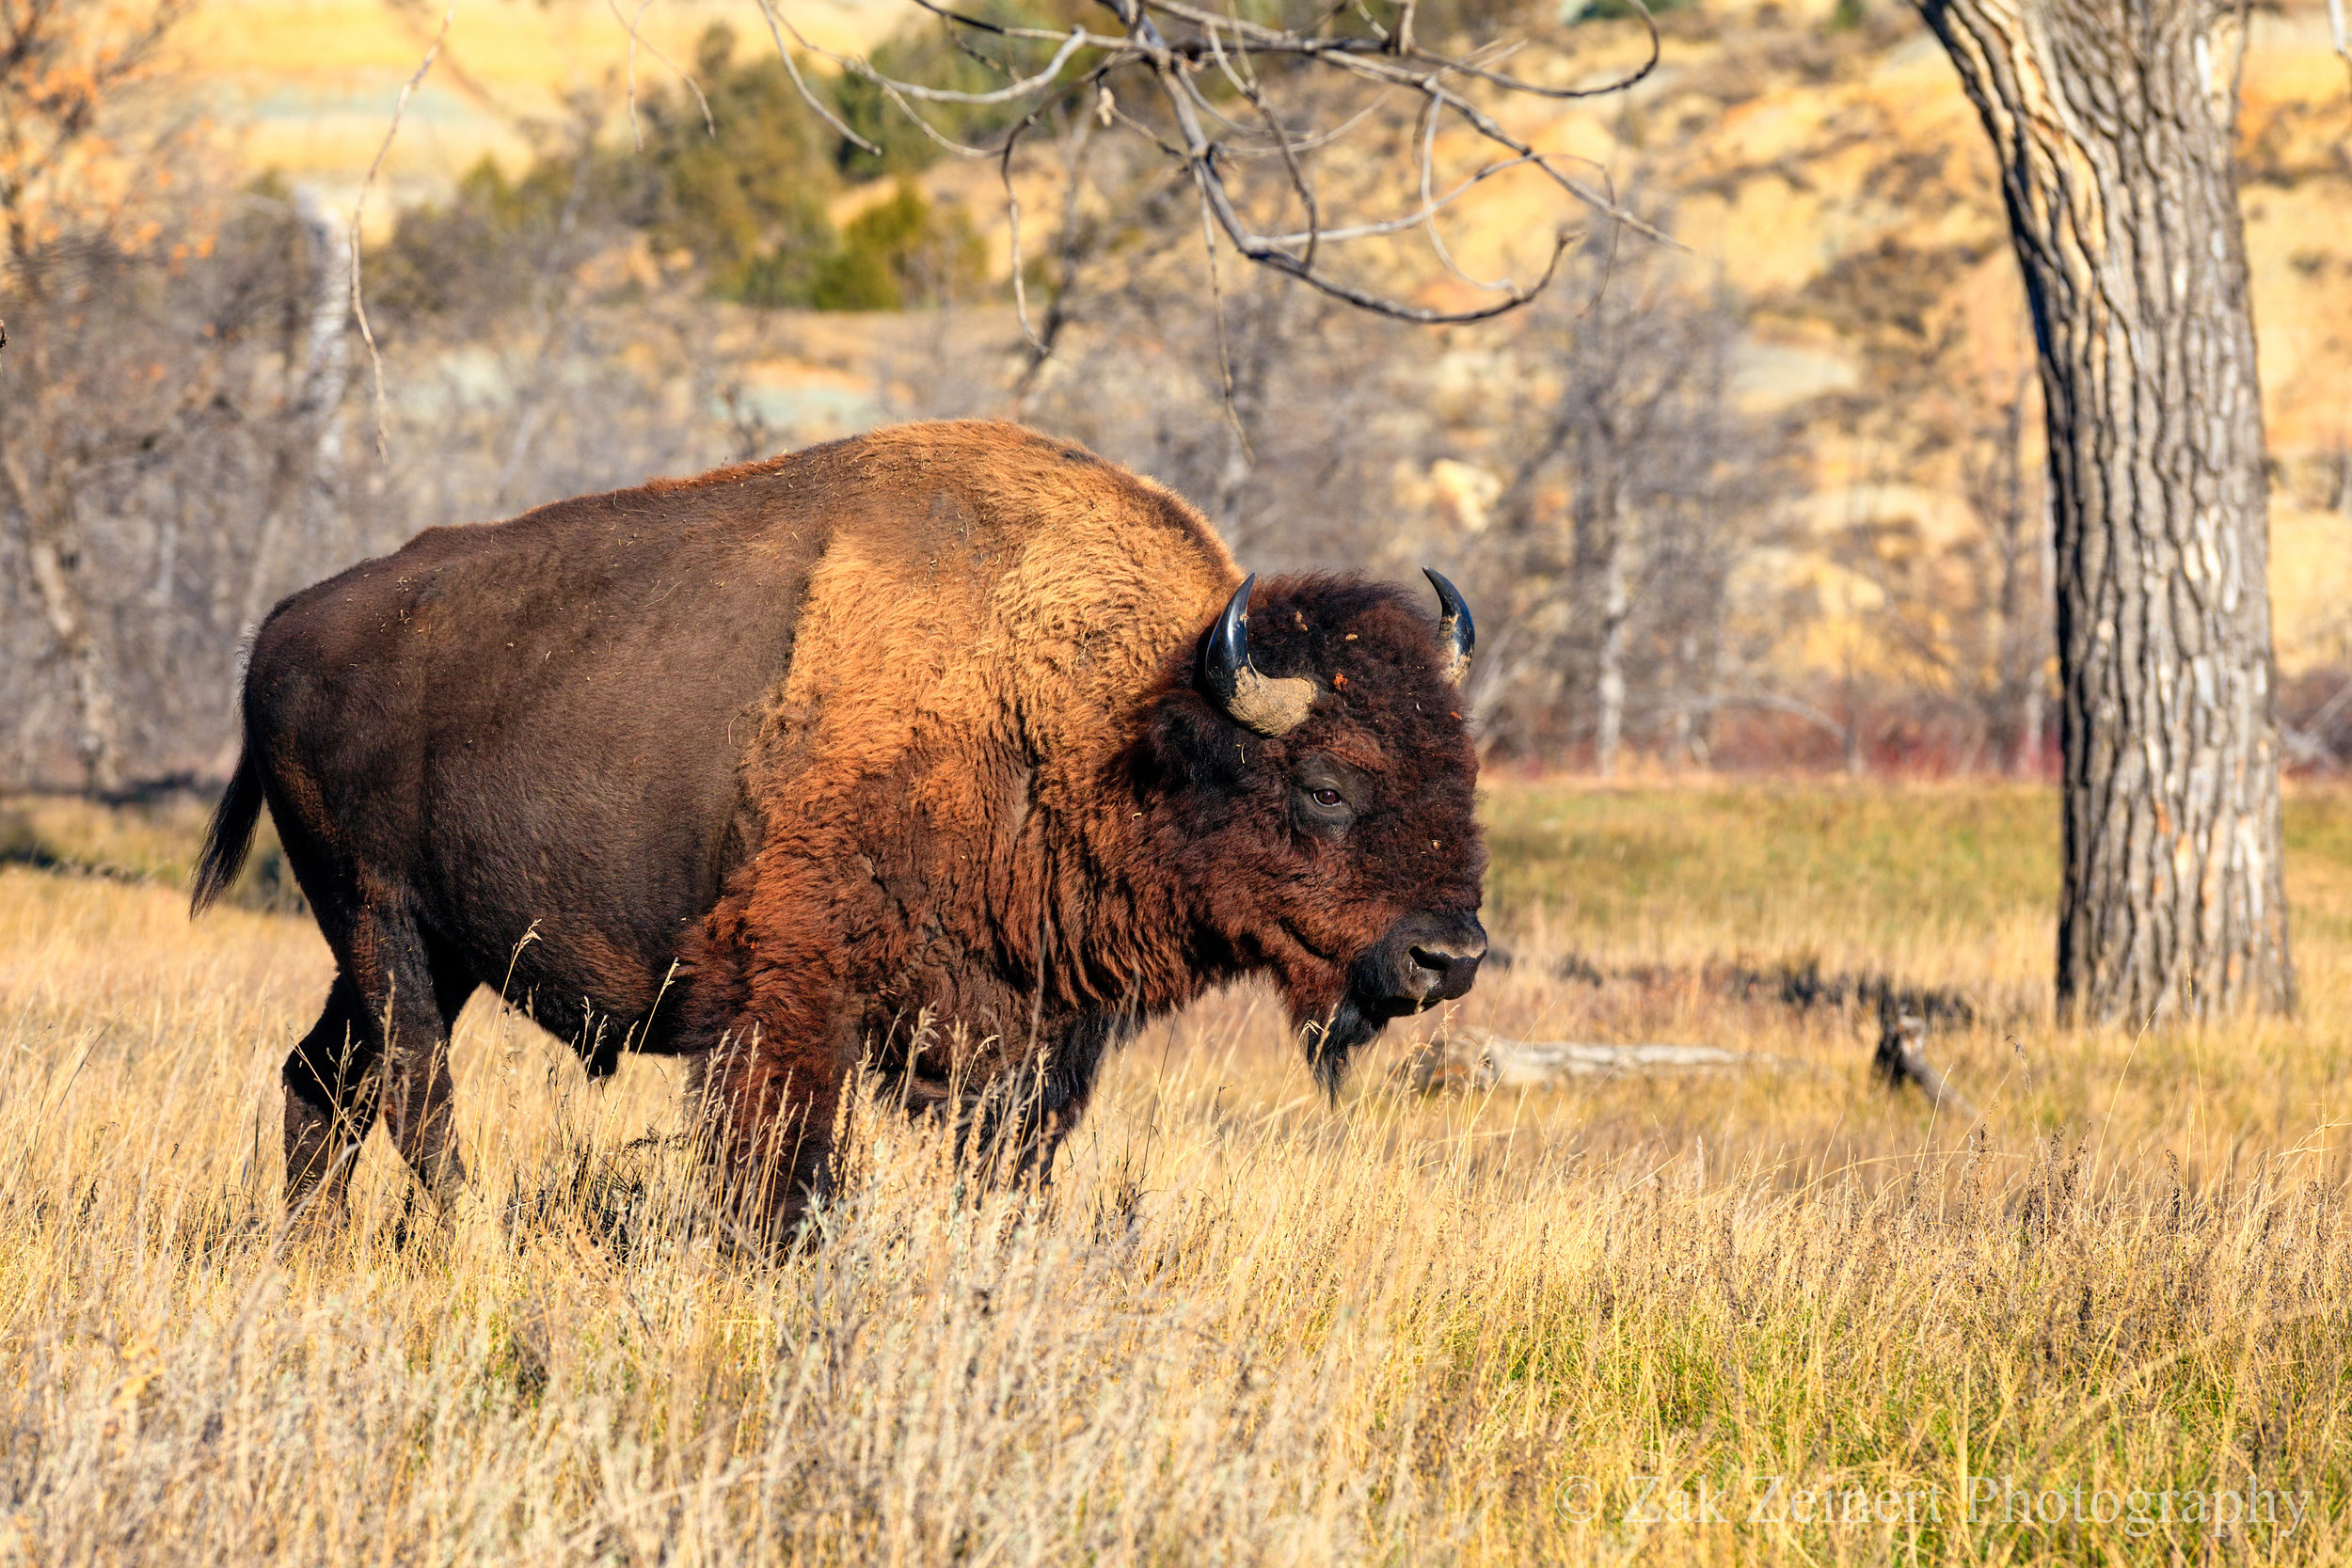 A buffalo wanders through my camp at Juniper Campground